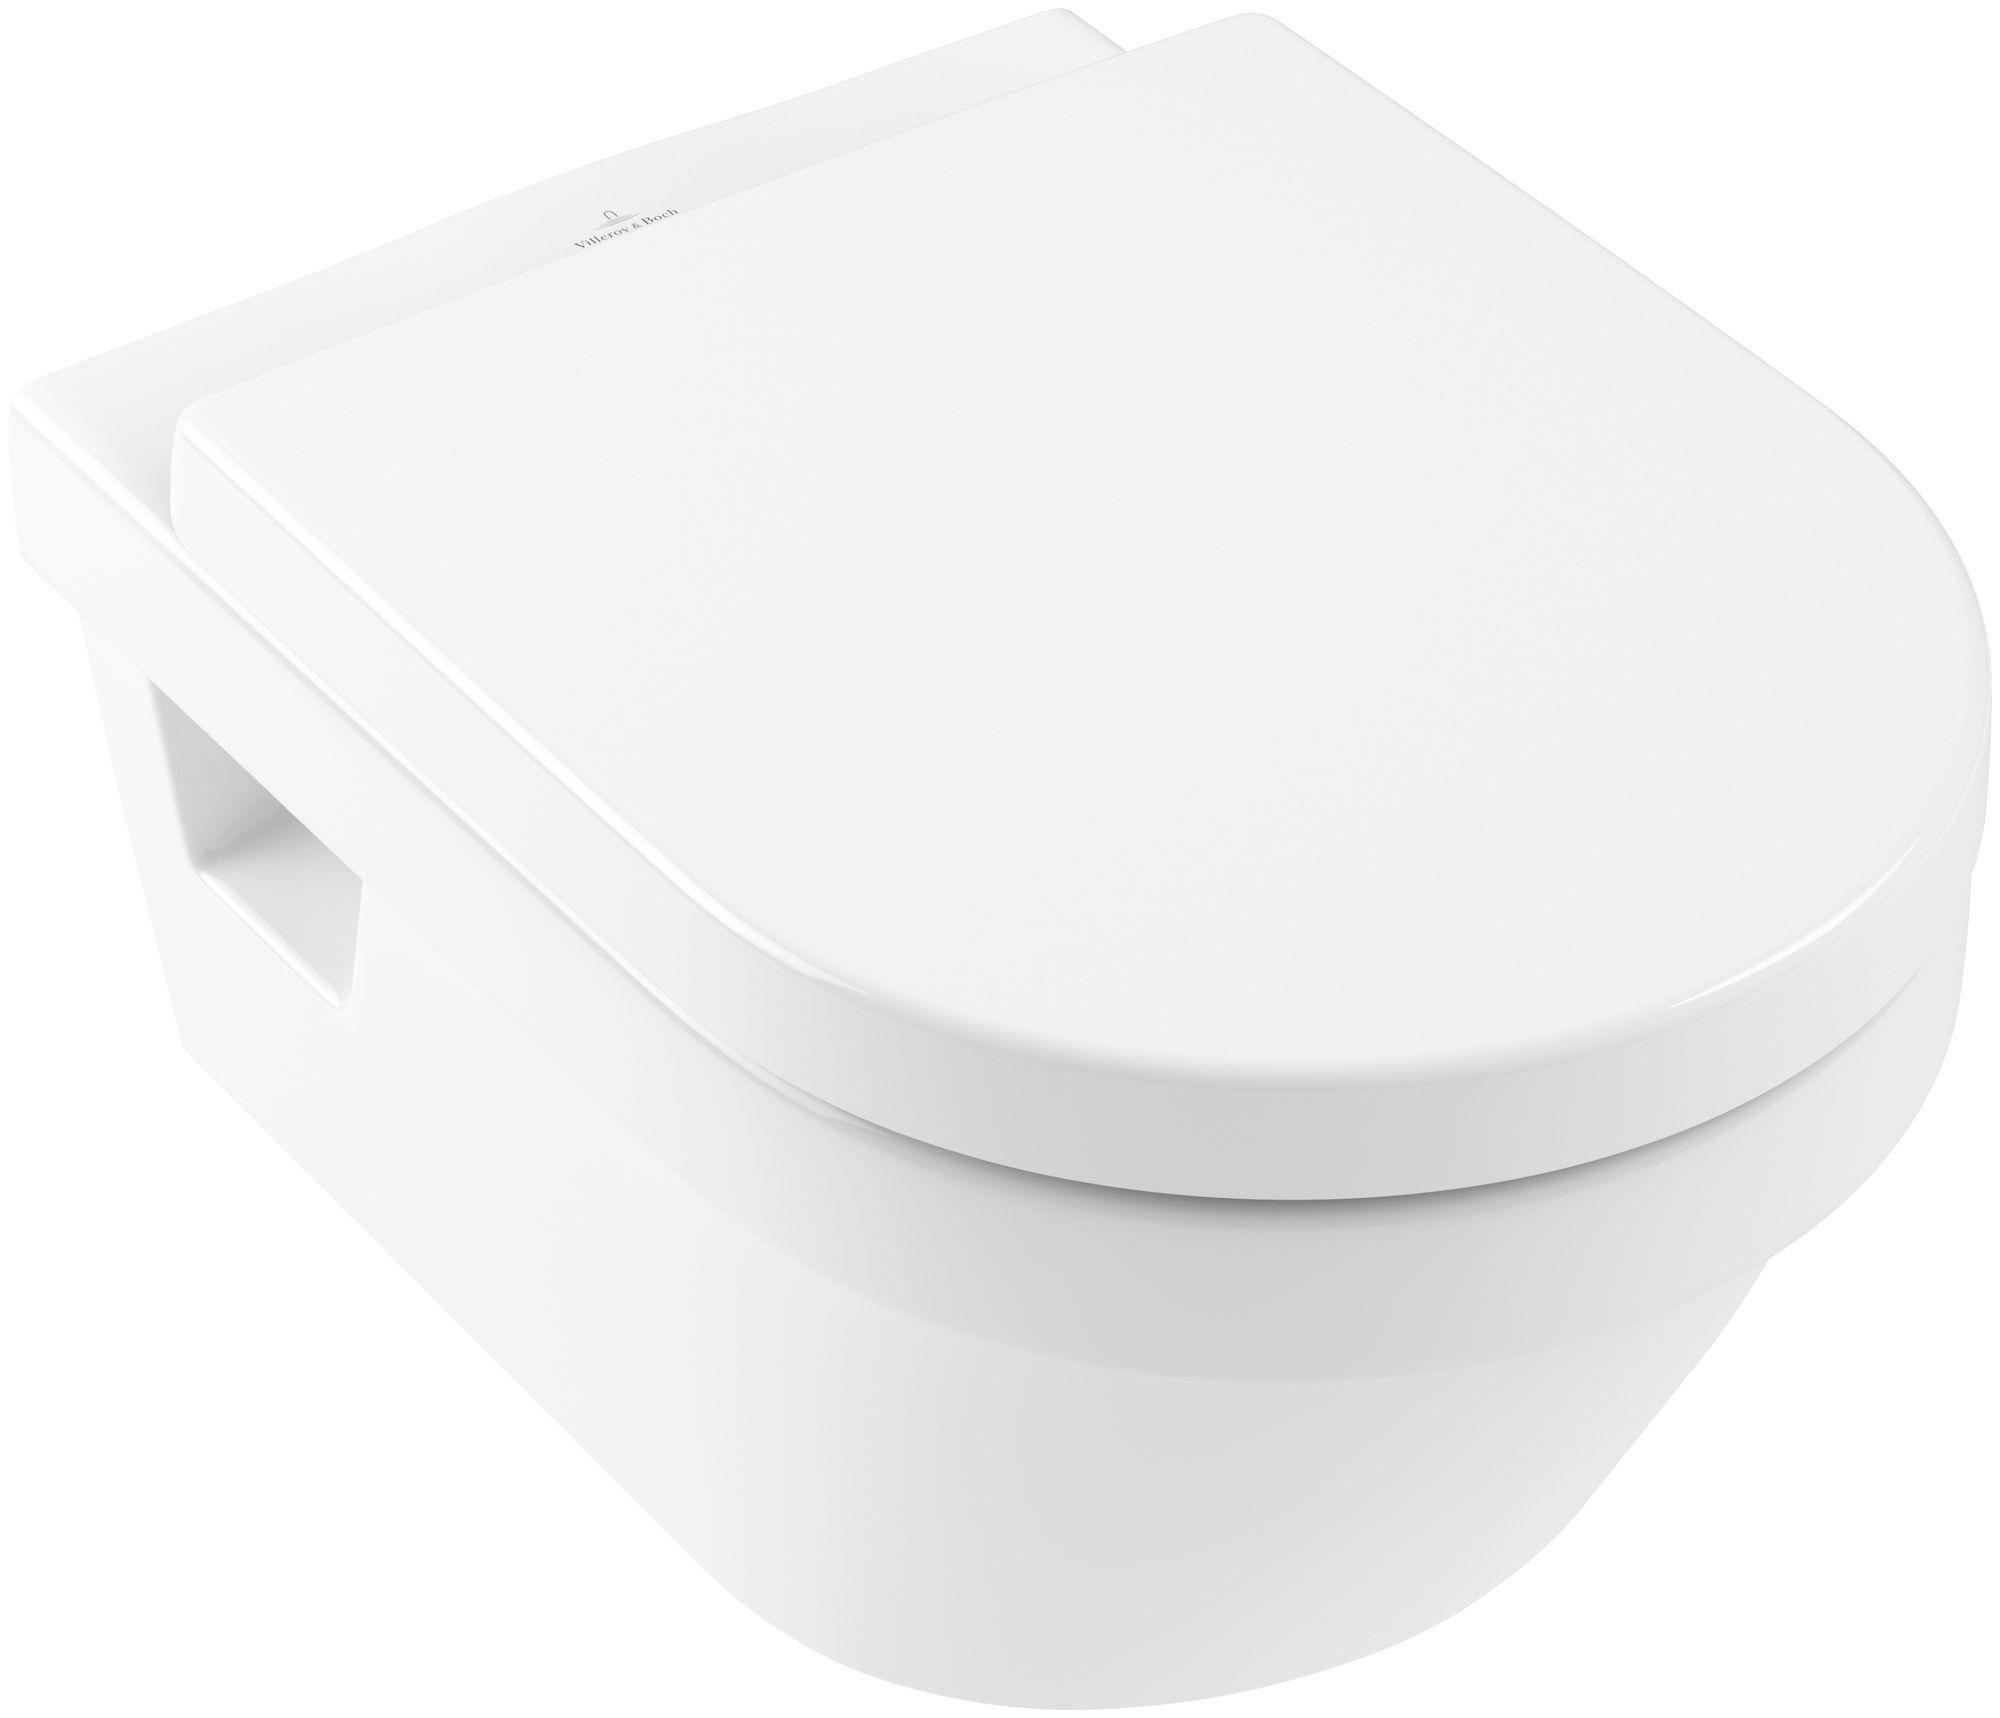 Villeroy & Boch Architectura Wand-Tiefspül-WC DirectFlush mit offenem Spülrand L:53xB:37cm Weiß Alpin mit CeramicPlus 5684R0R1